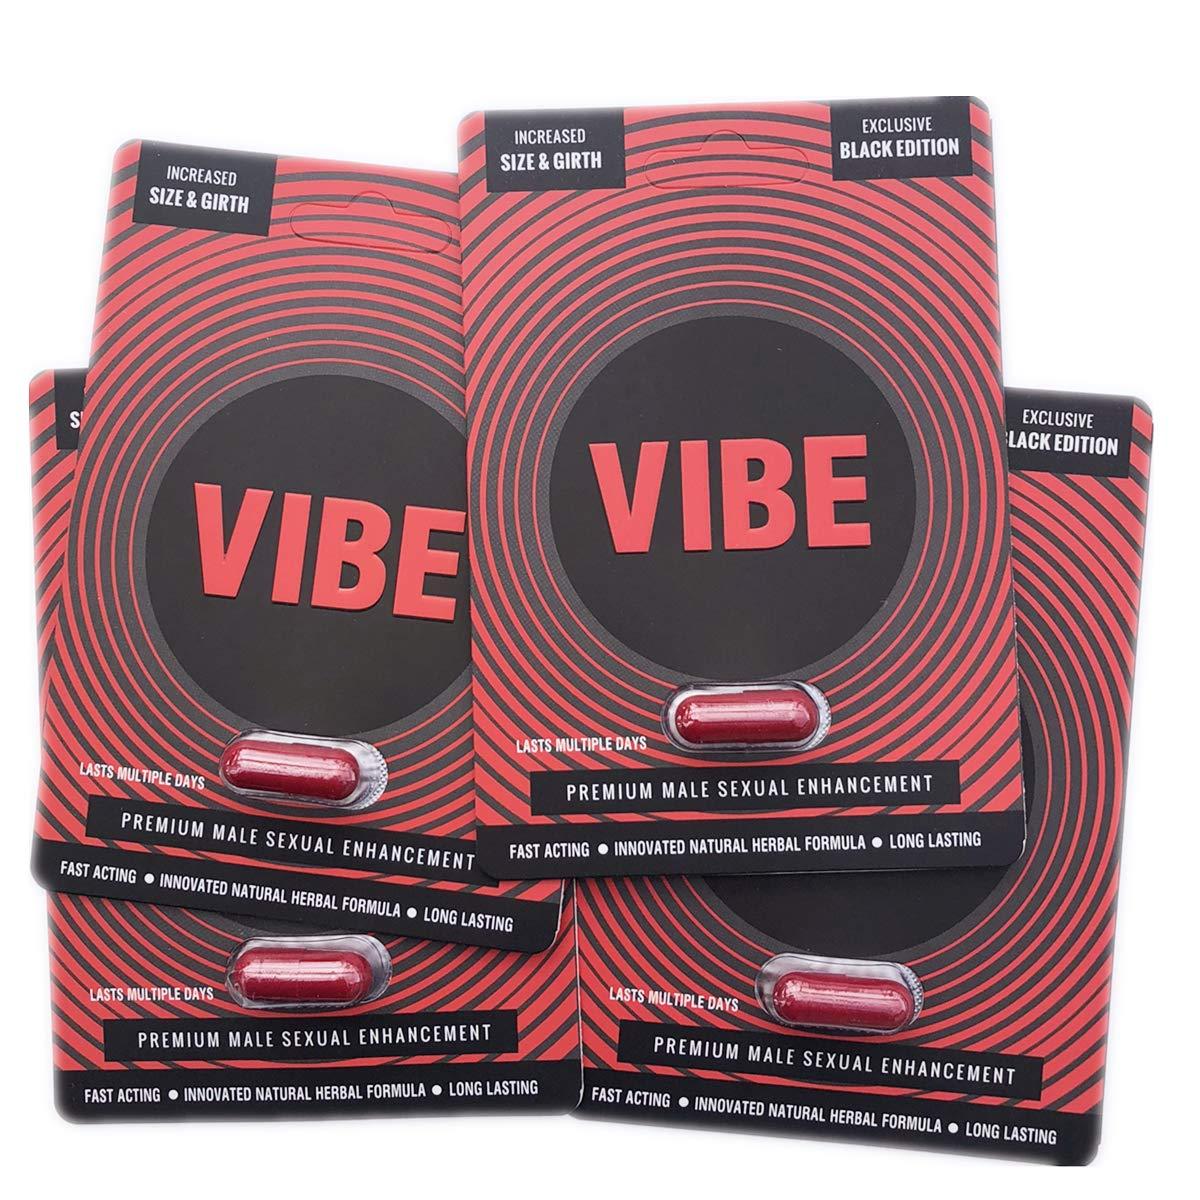 The Red VIBE Black Premium Men Male Enhancement Enhacing Pills (4) by Vibe